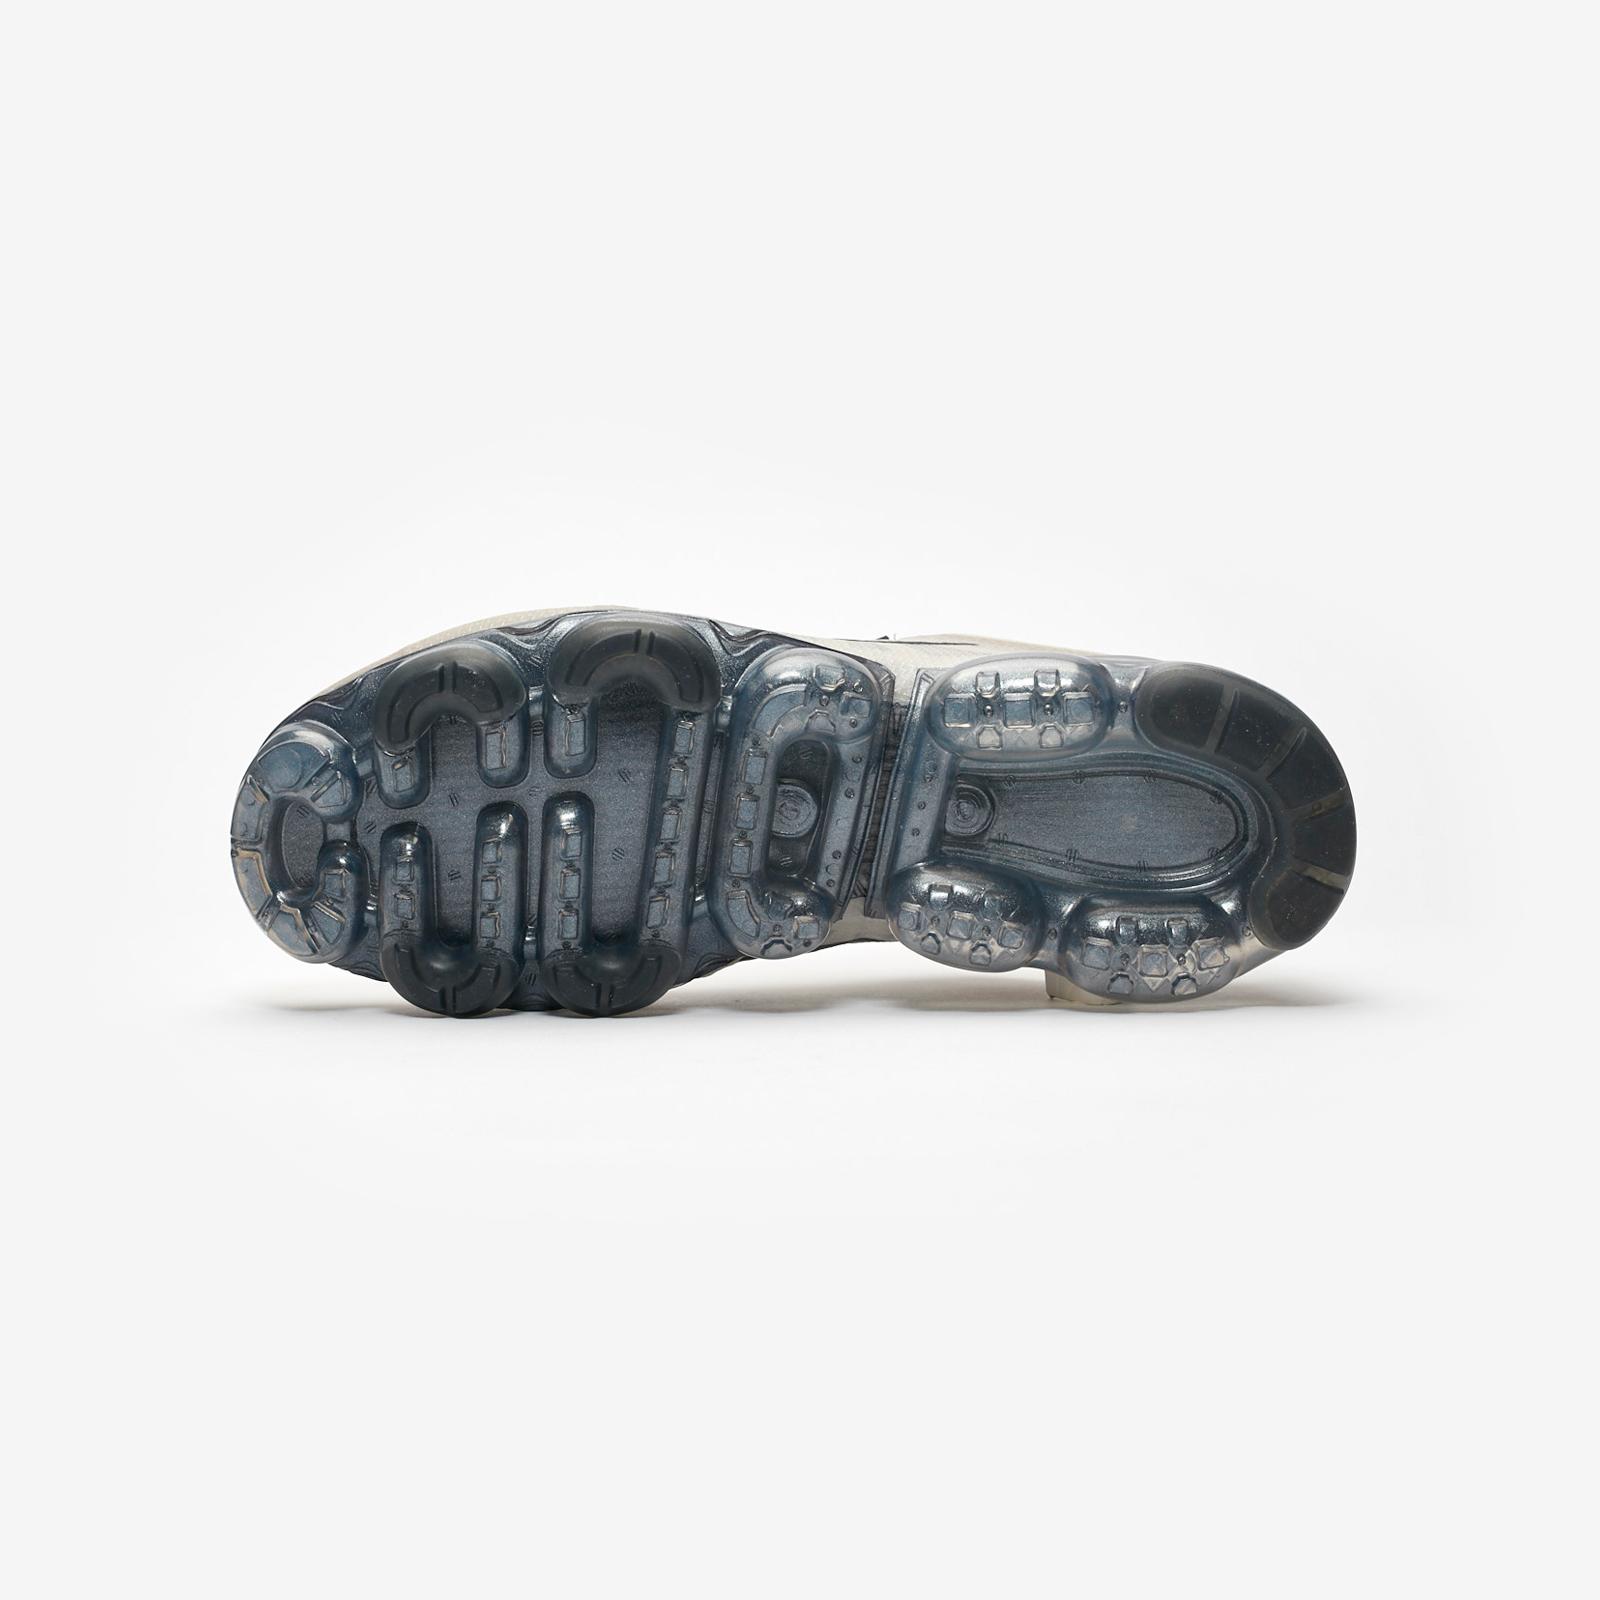 Nike Sneakersnstuffsneakers Air Ar6631 Kl31ctfj 2019 Vapormax 200 Yymfgv6Ib7